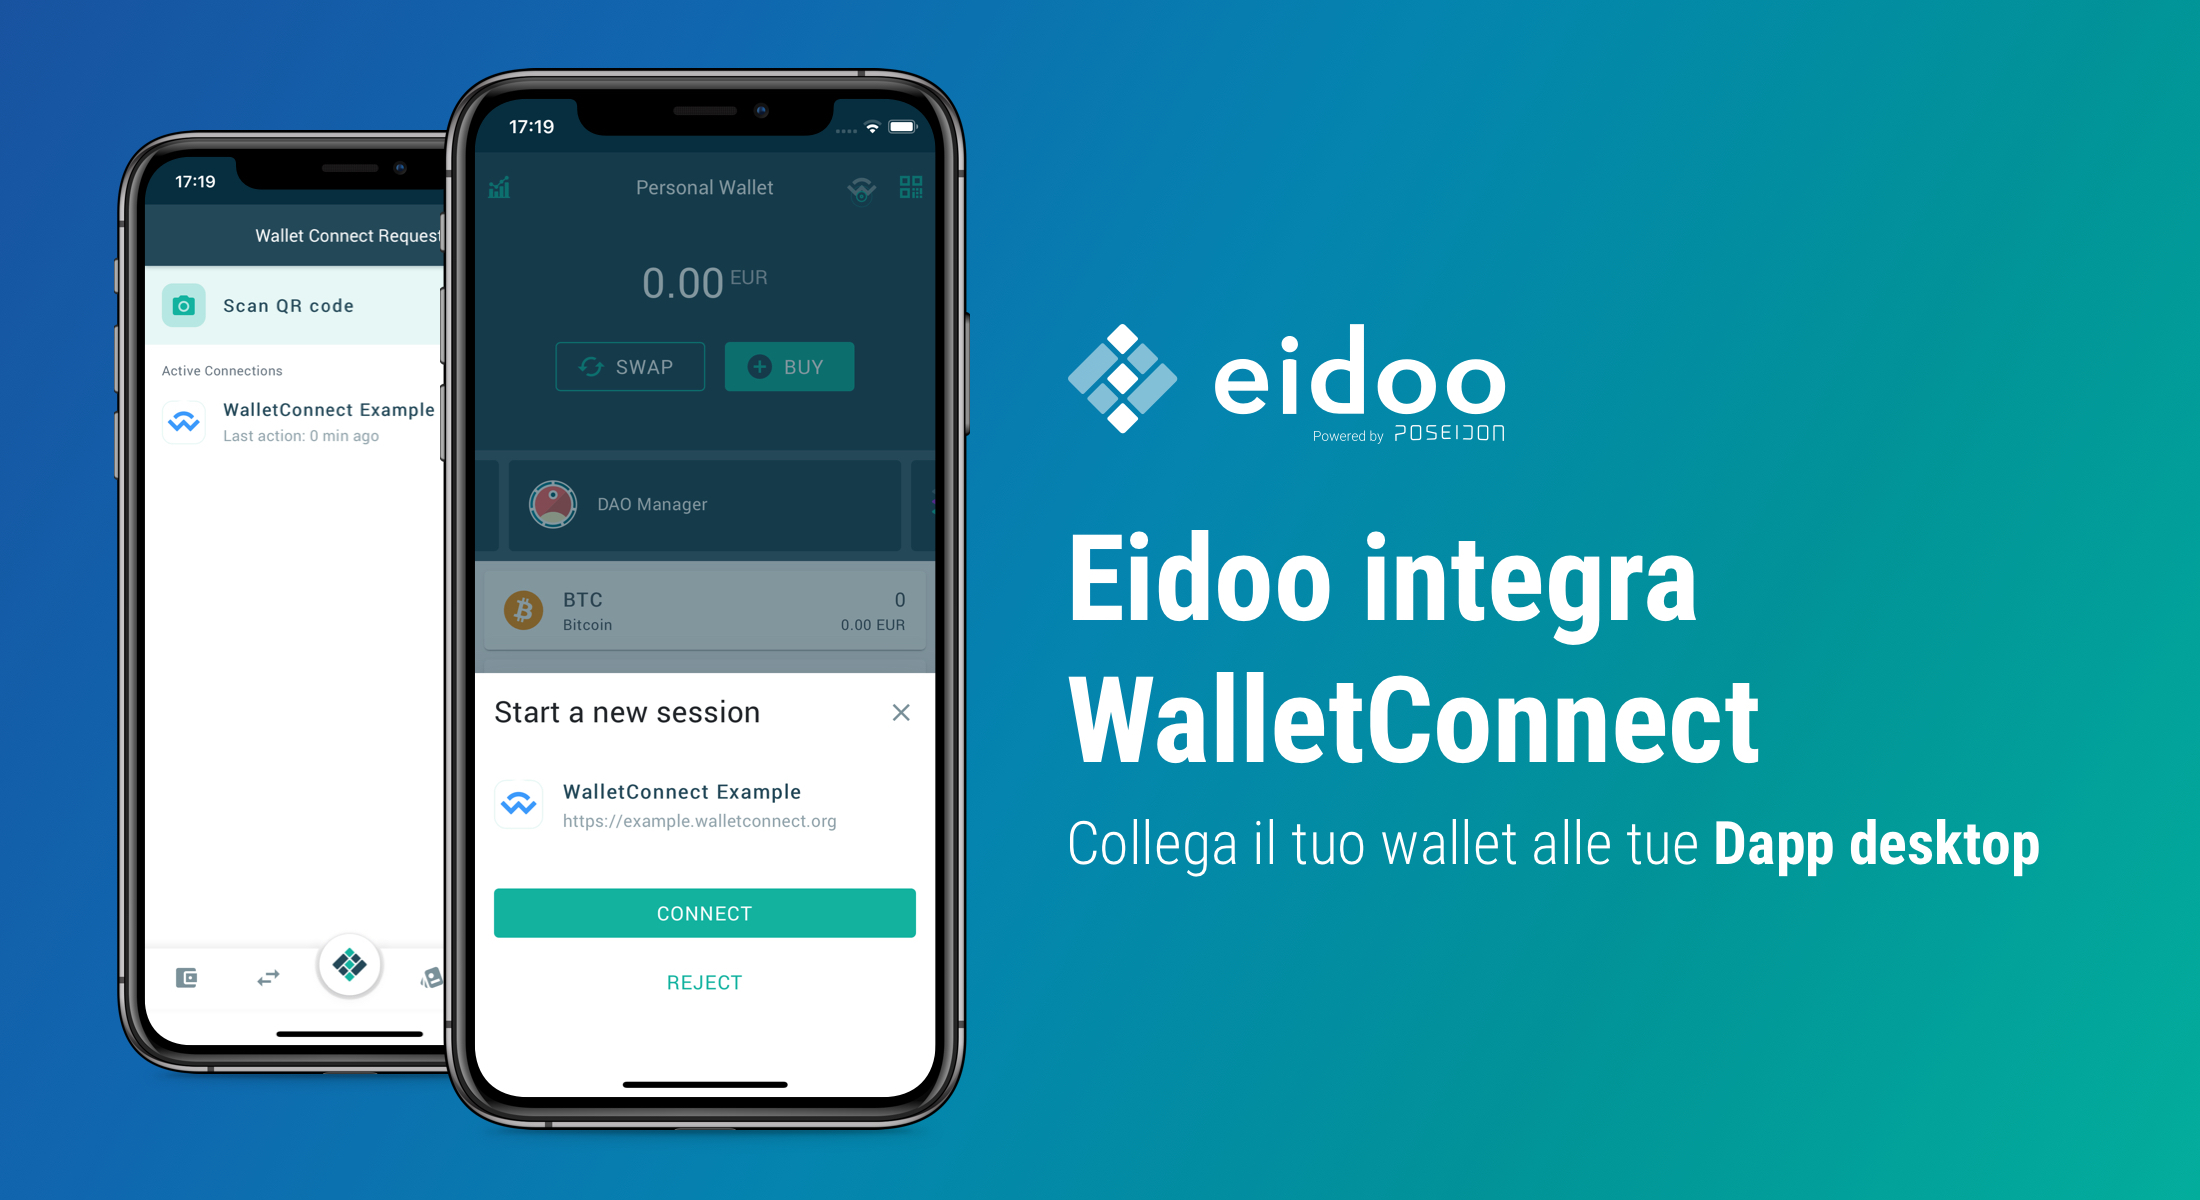 Eidoo integra WalletConnect